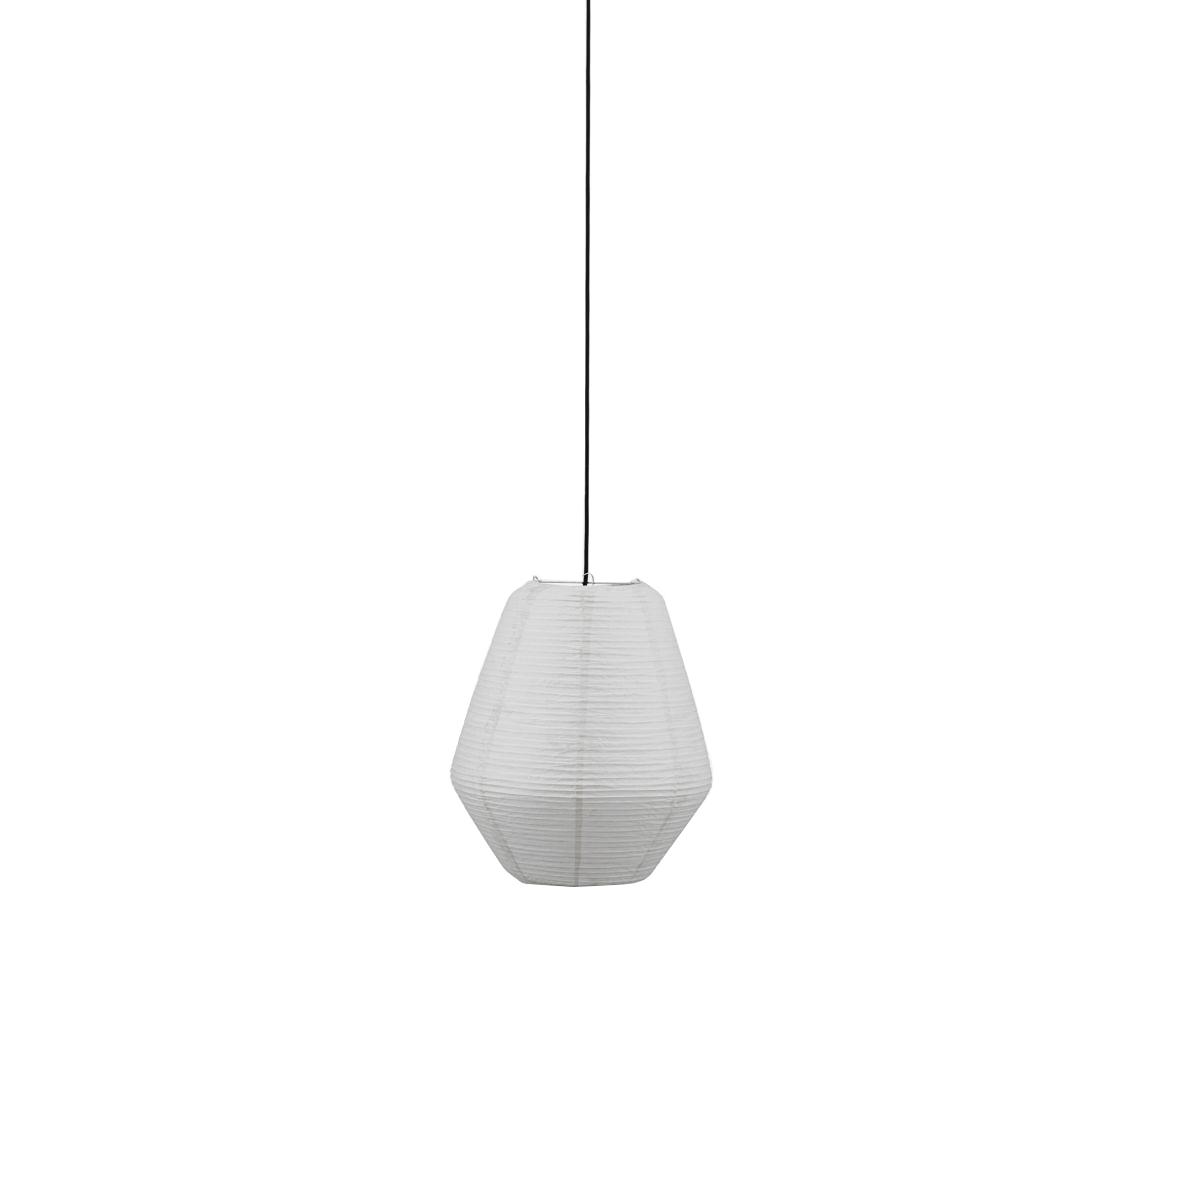 House Doctor - Bidar Lamp Shade Ø 36 cm - Grey (259370112)